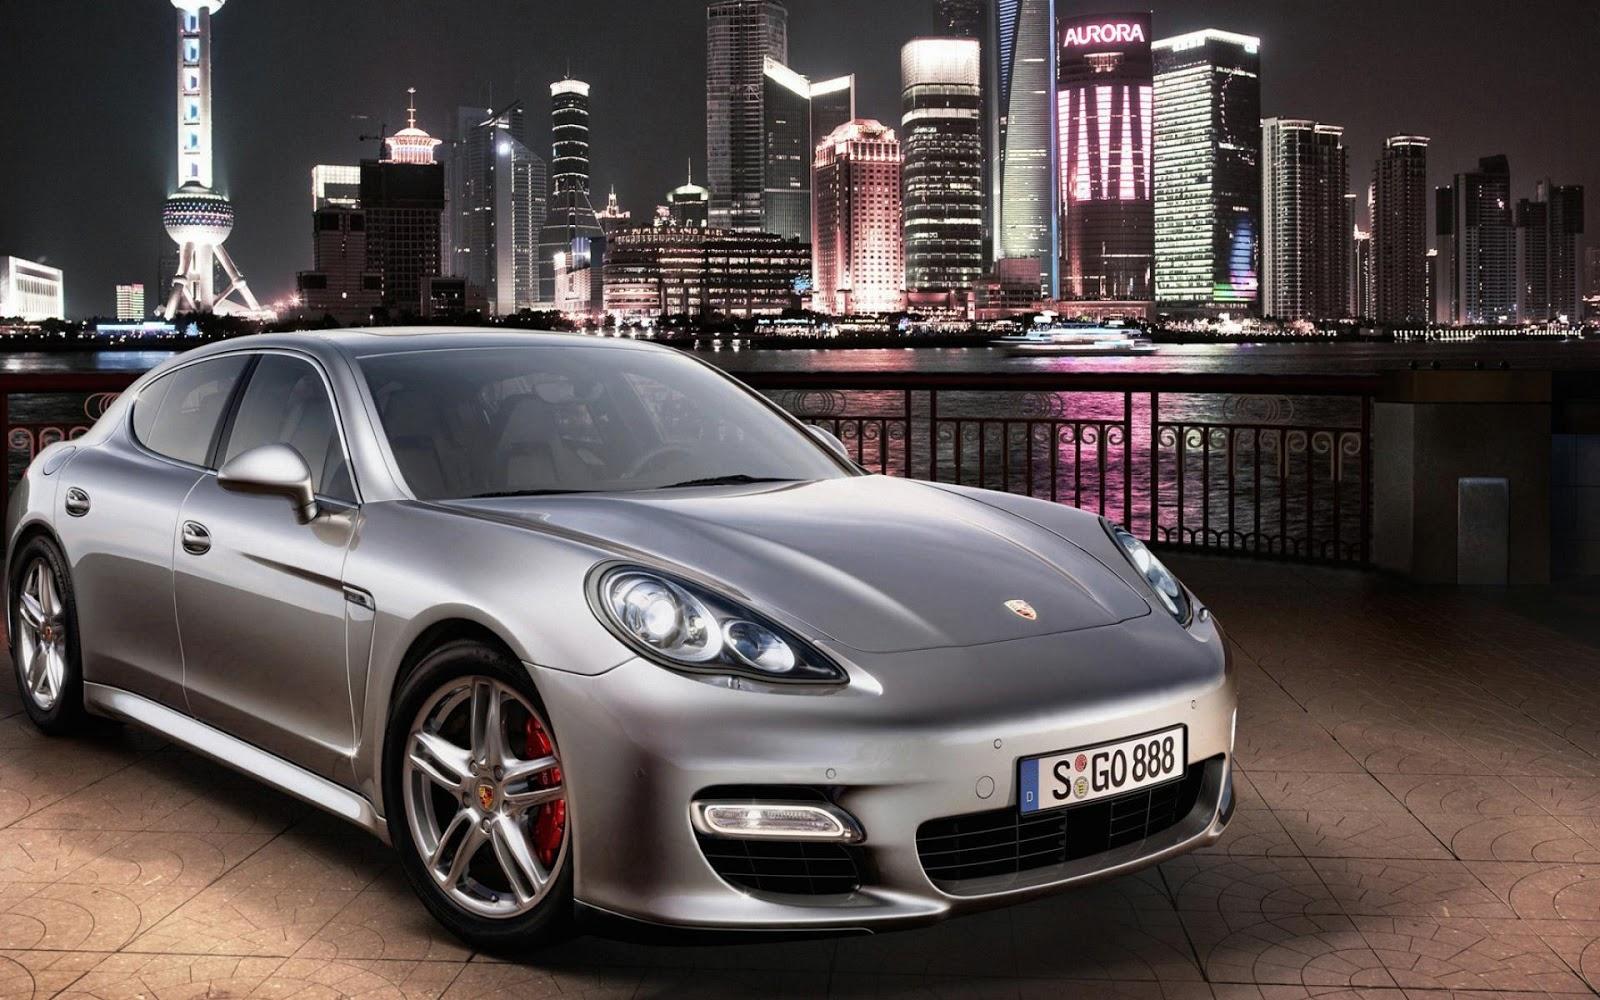 Porsche Panamera in Asia